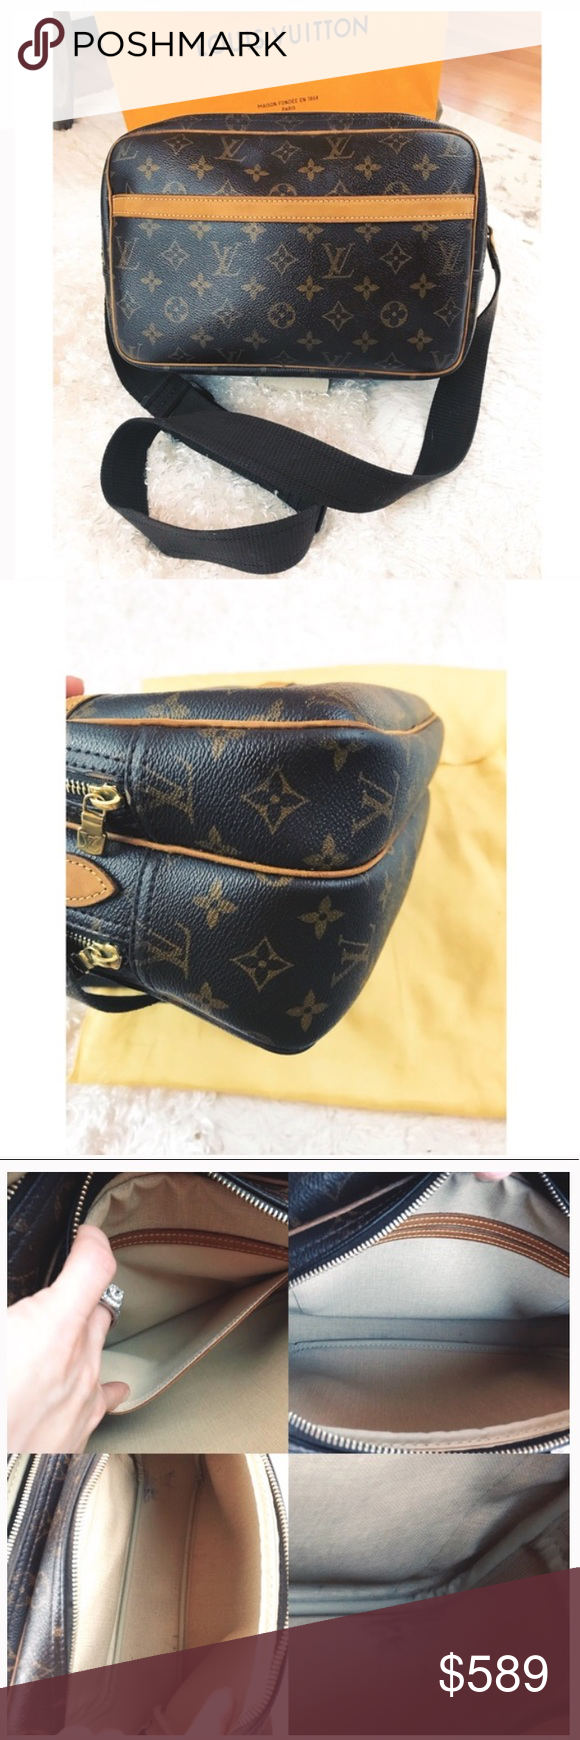 d00f7356f2df Spotted while shopping on Poshmark  LV Reporter Monogram!  poshmark  fashion   shopping  style  Louis Vuitton  Handbags